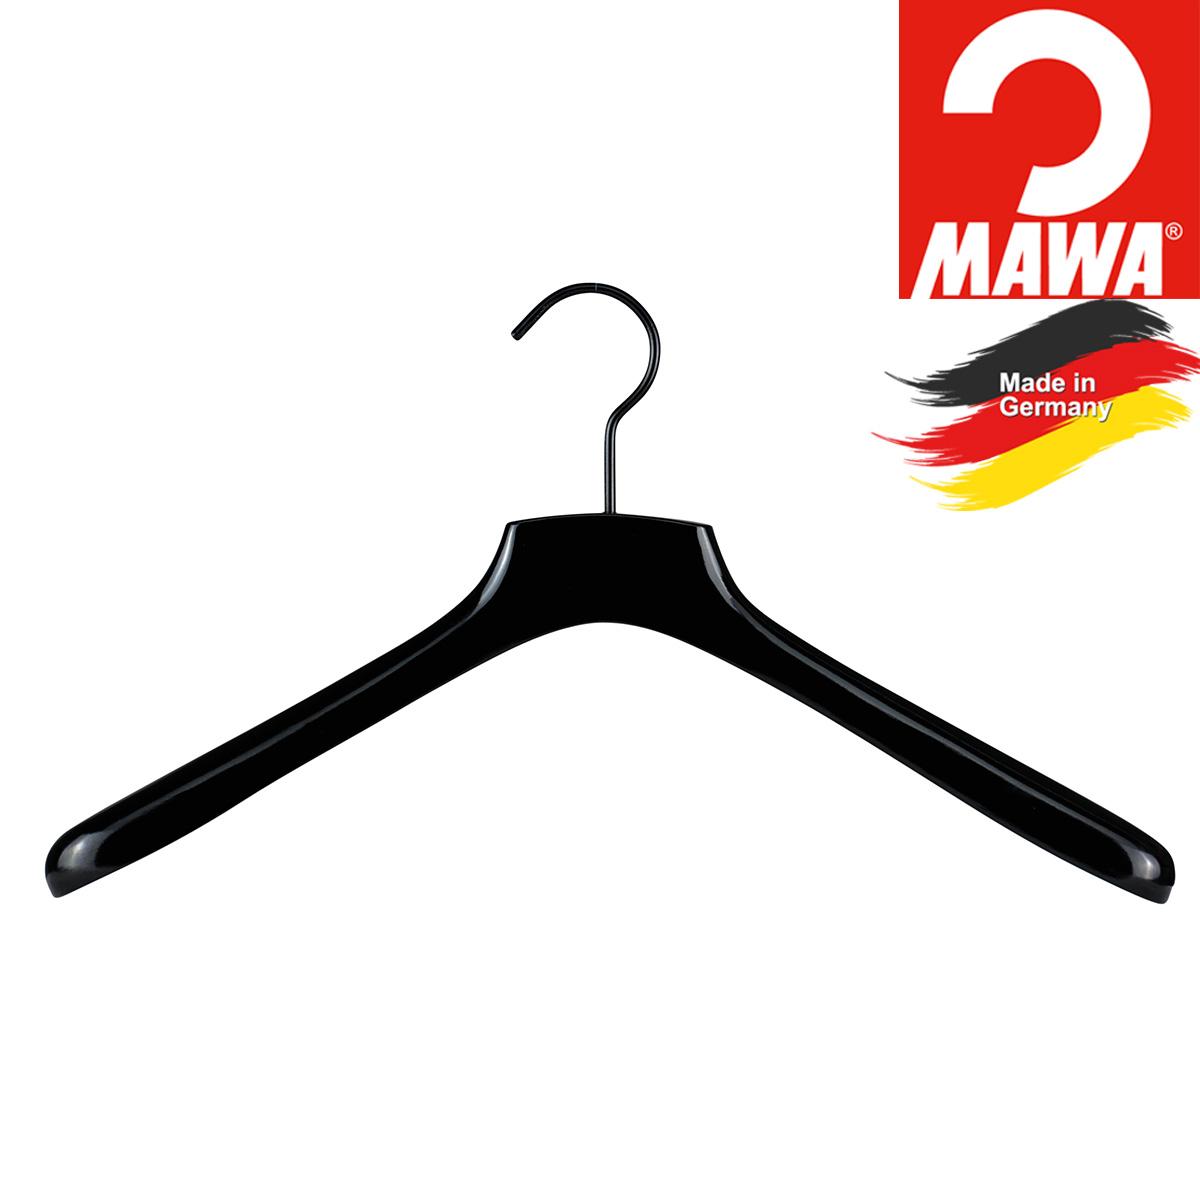 MAWA Oberteil-Kleiderbügel